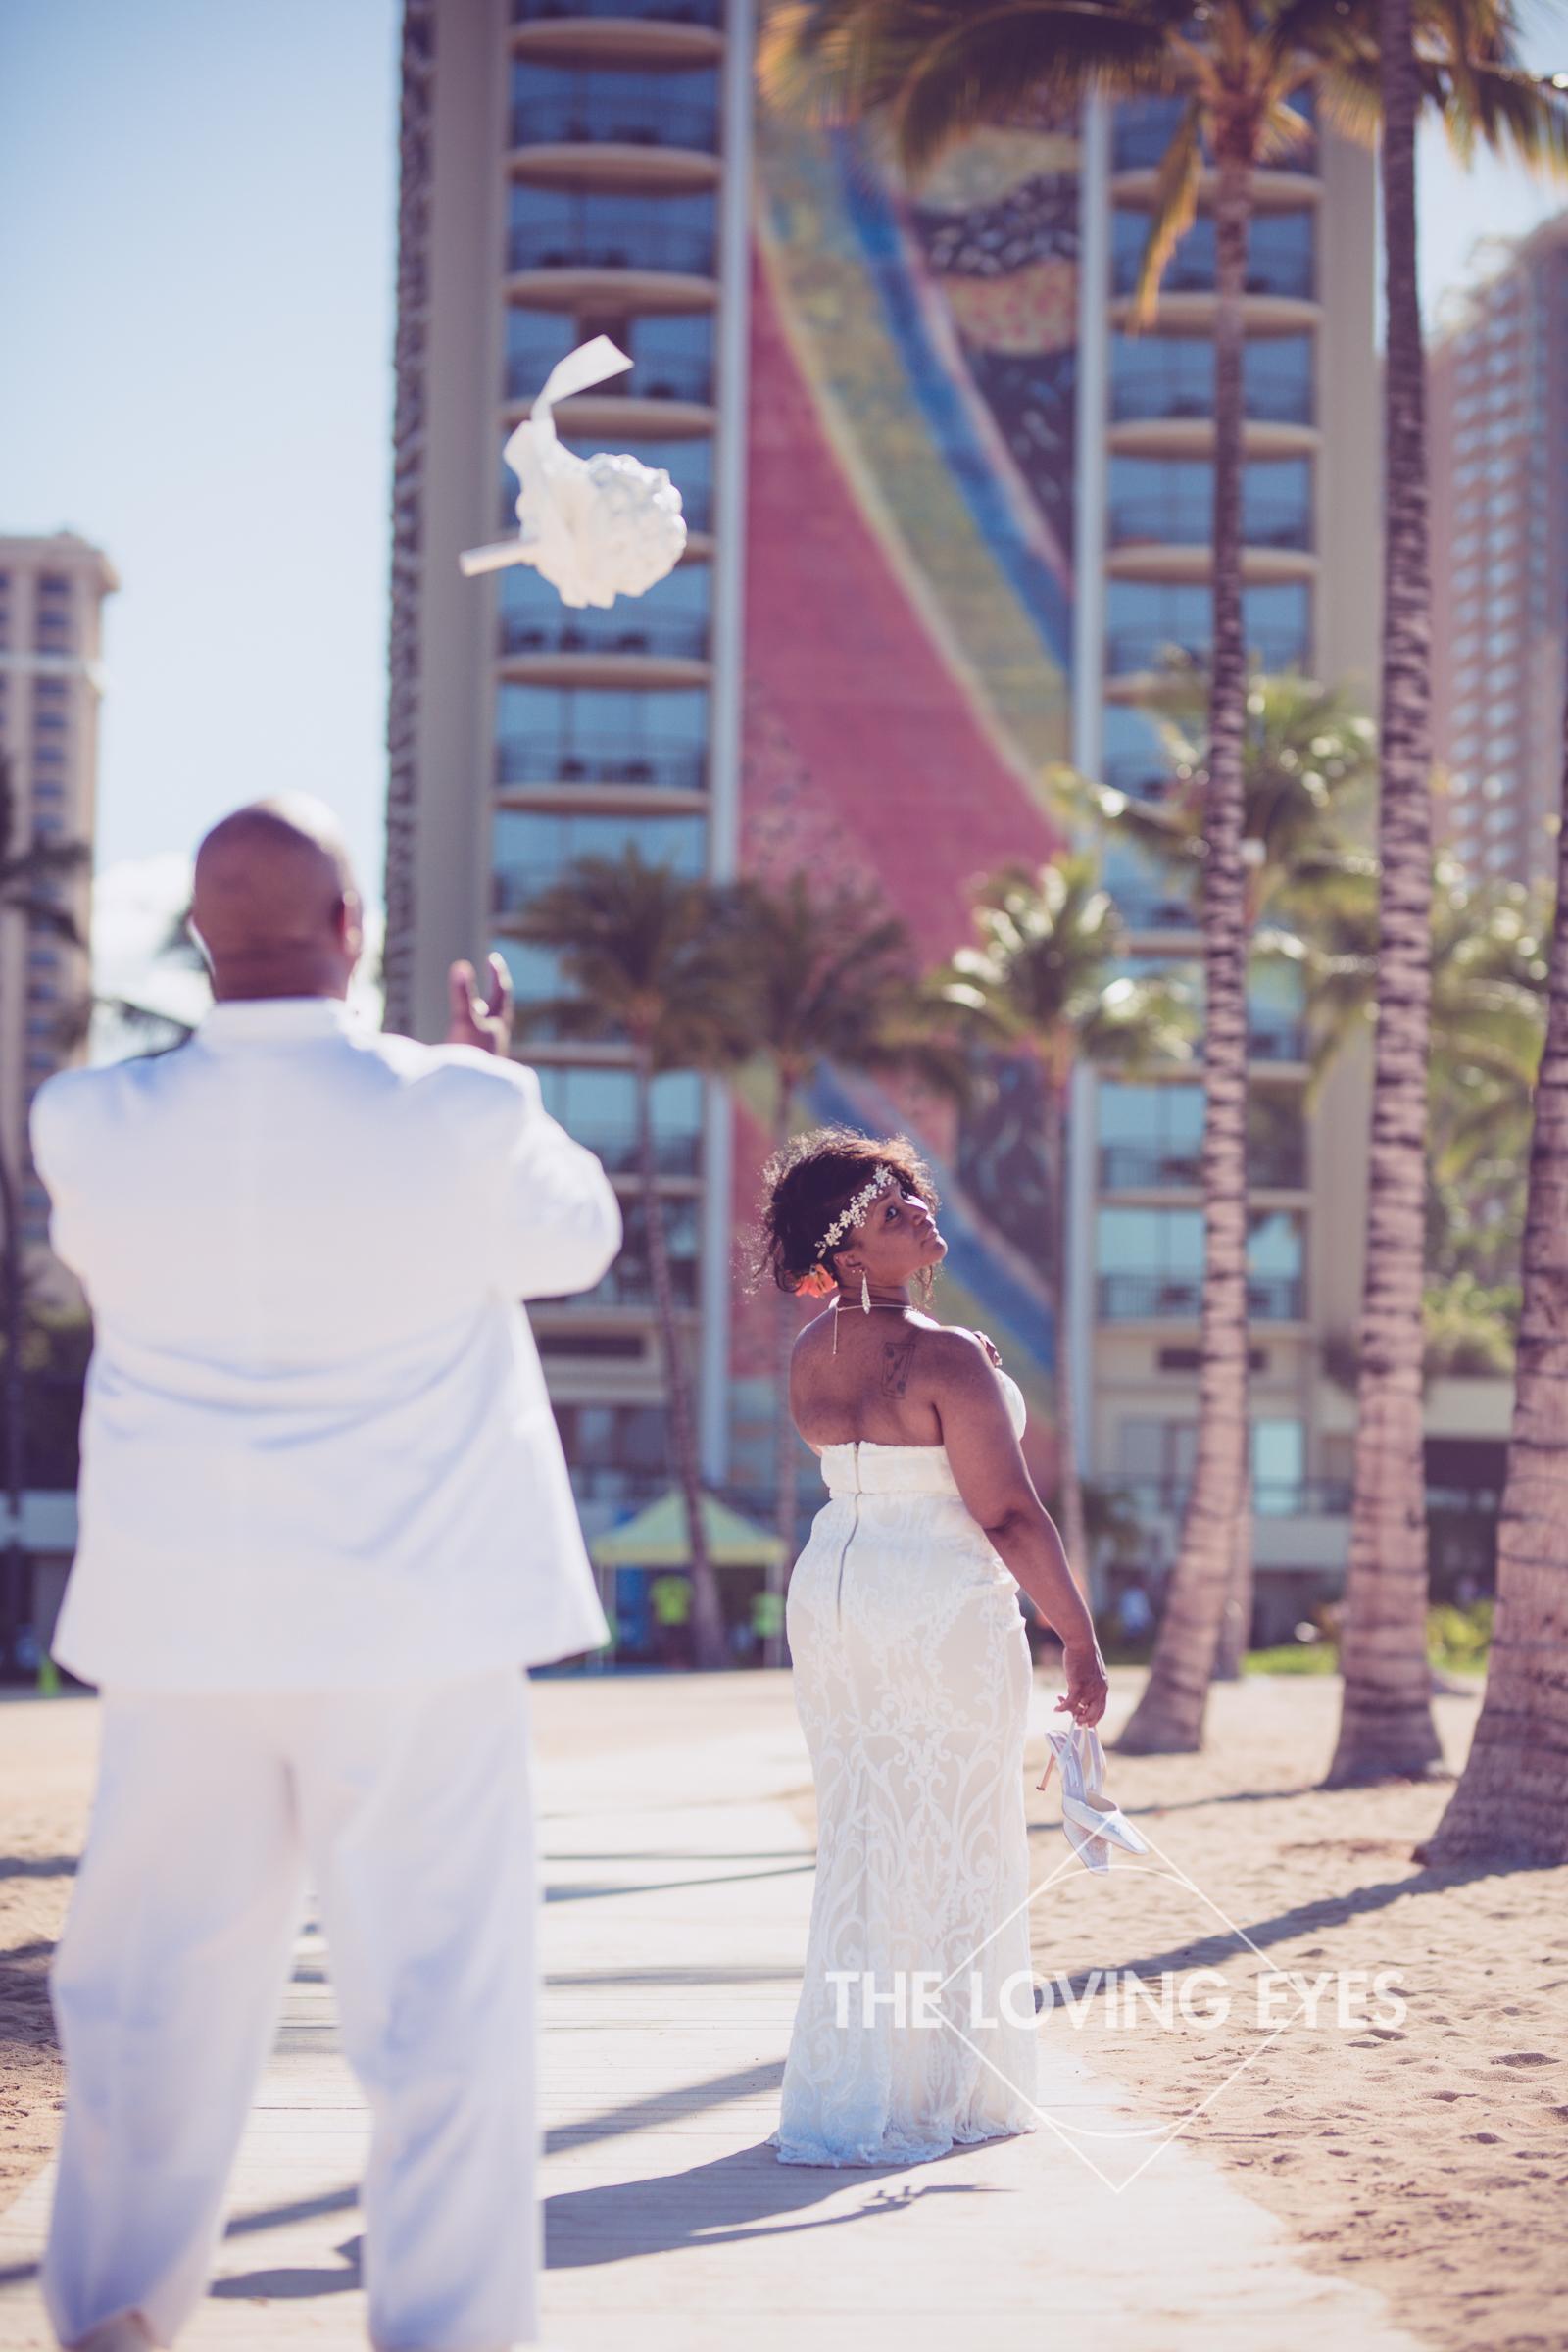 Honeymoon-Photos-in-Waikiki-16.jpg